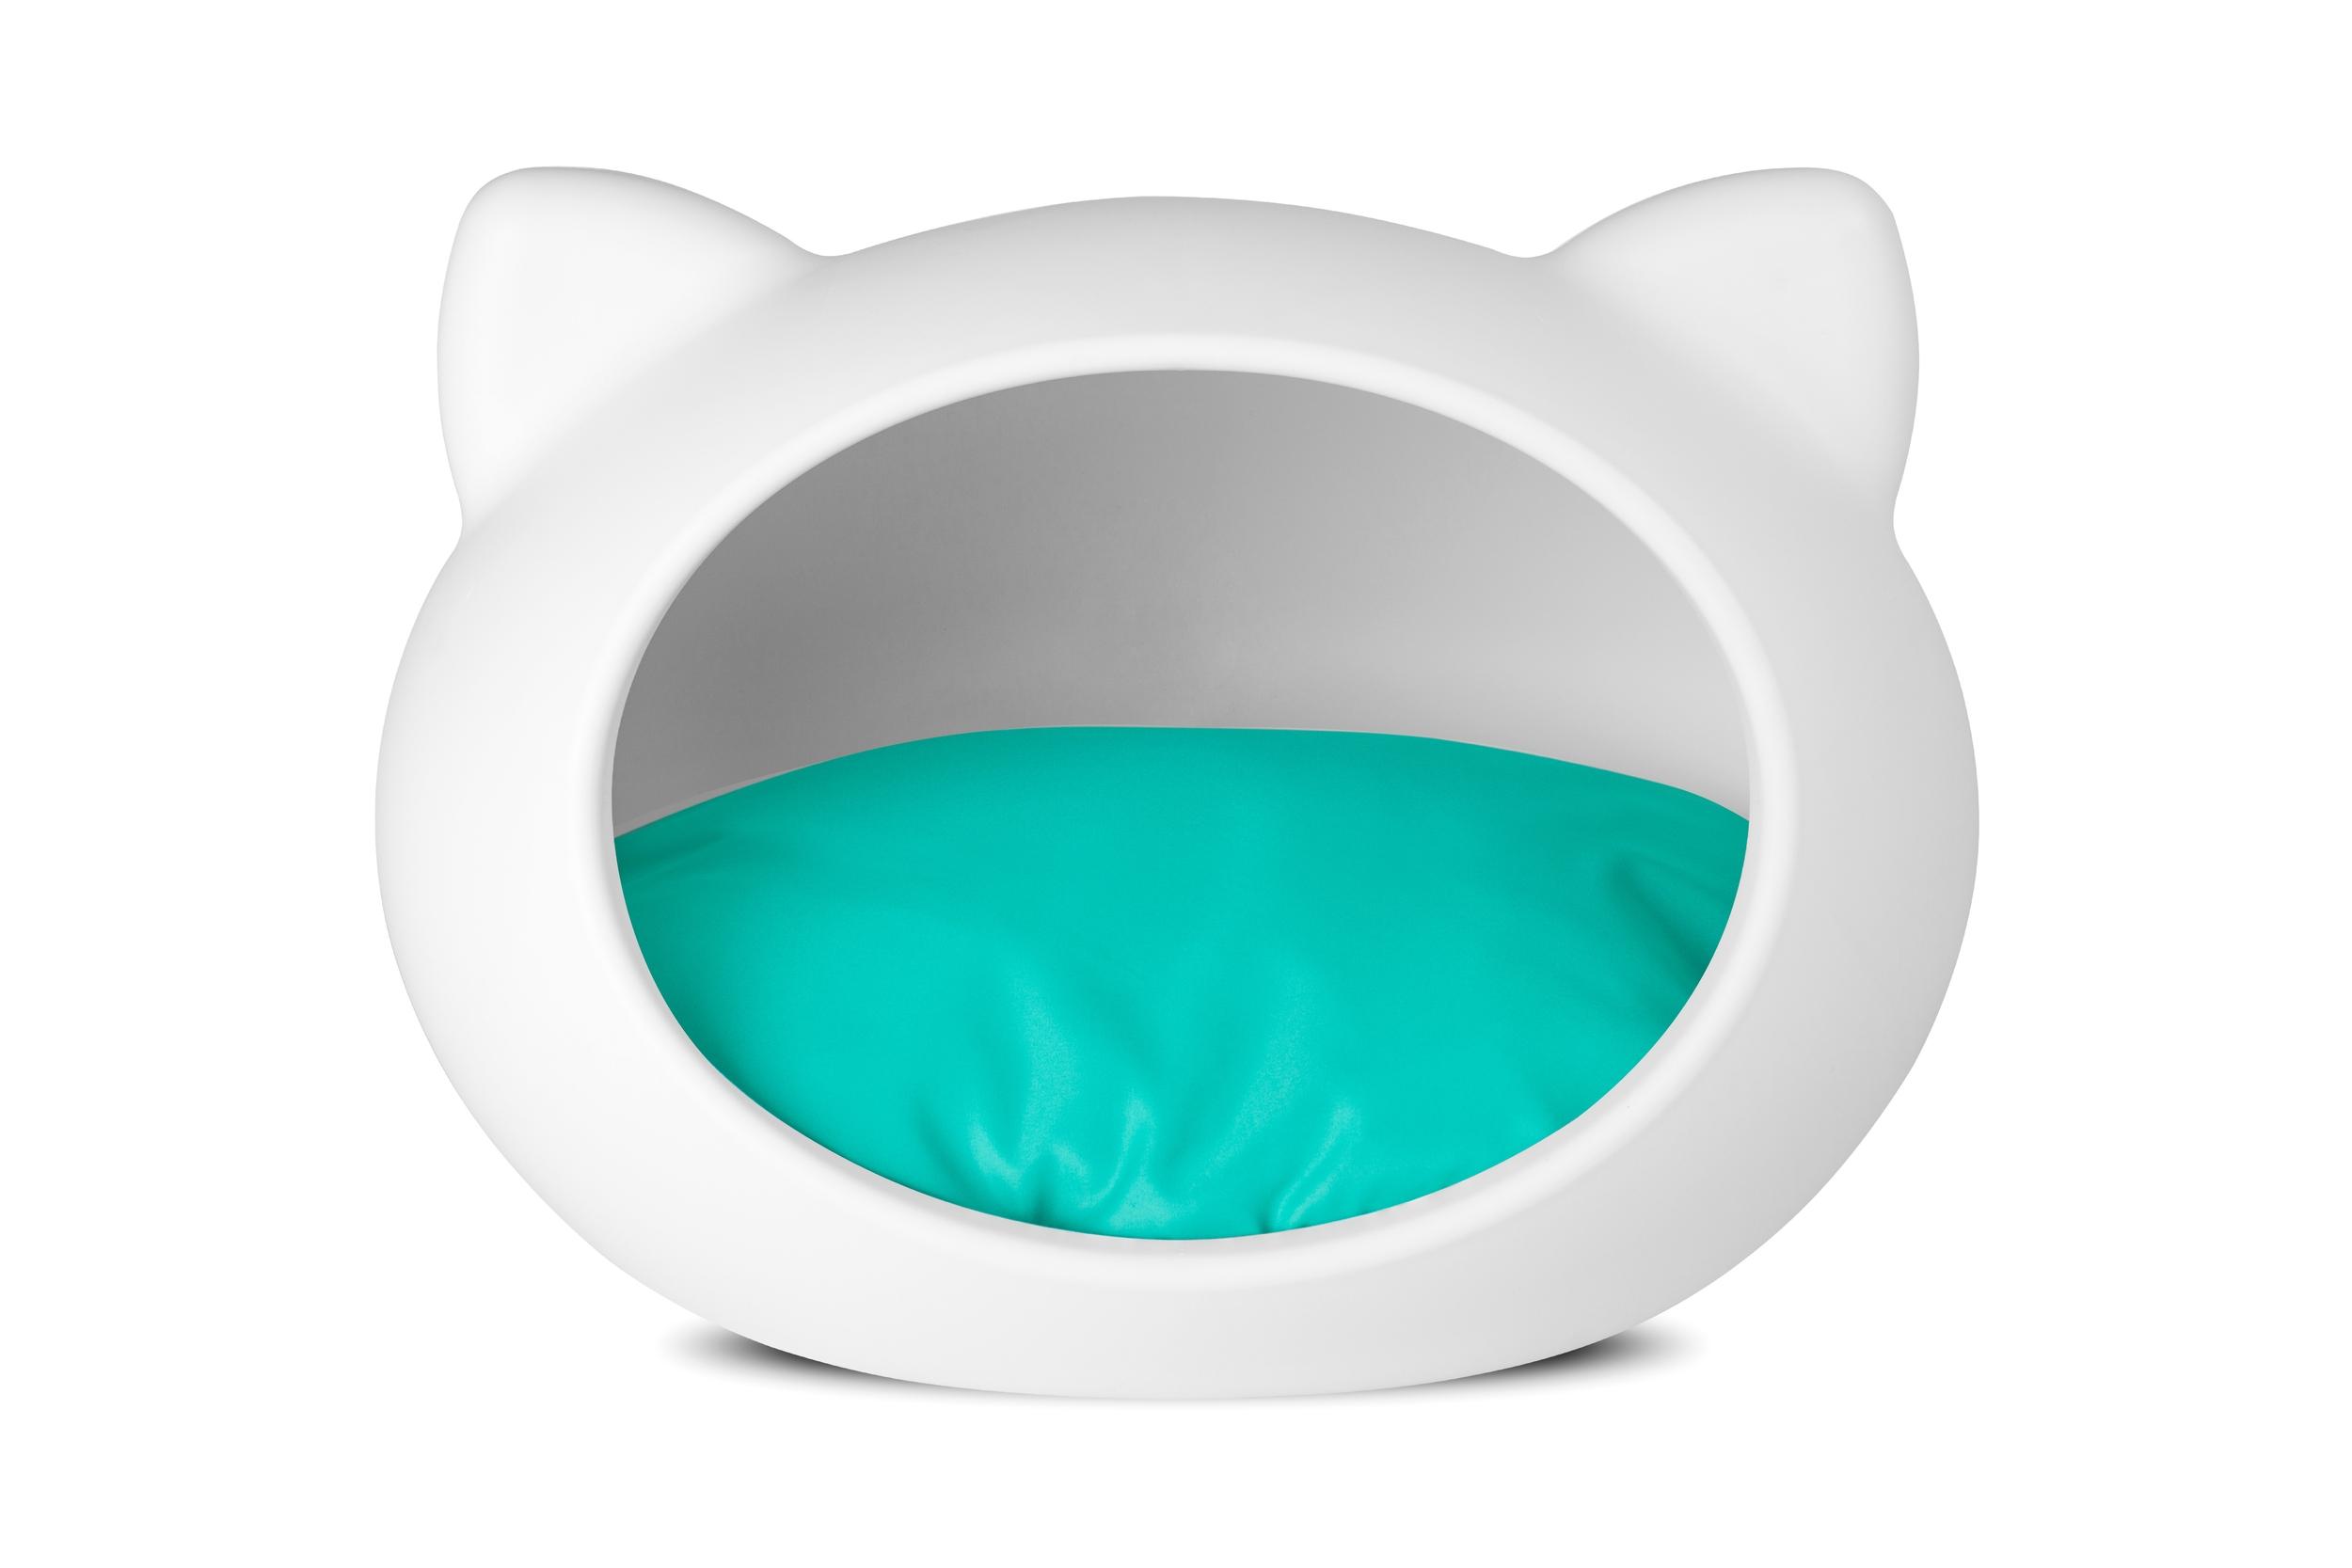 cat turquoise copy.jpg